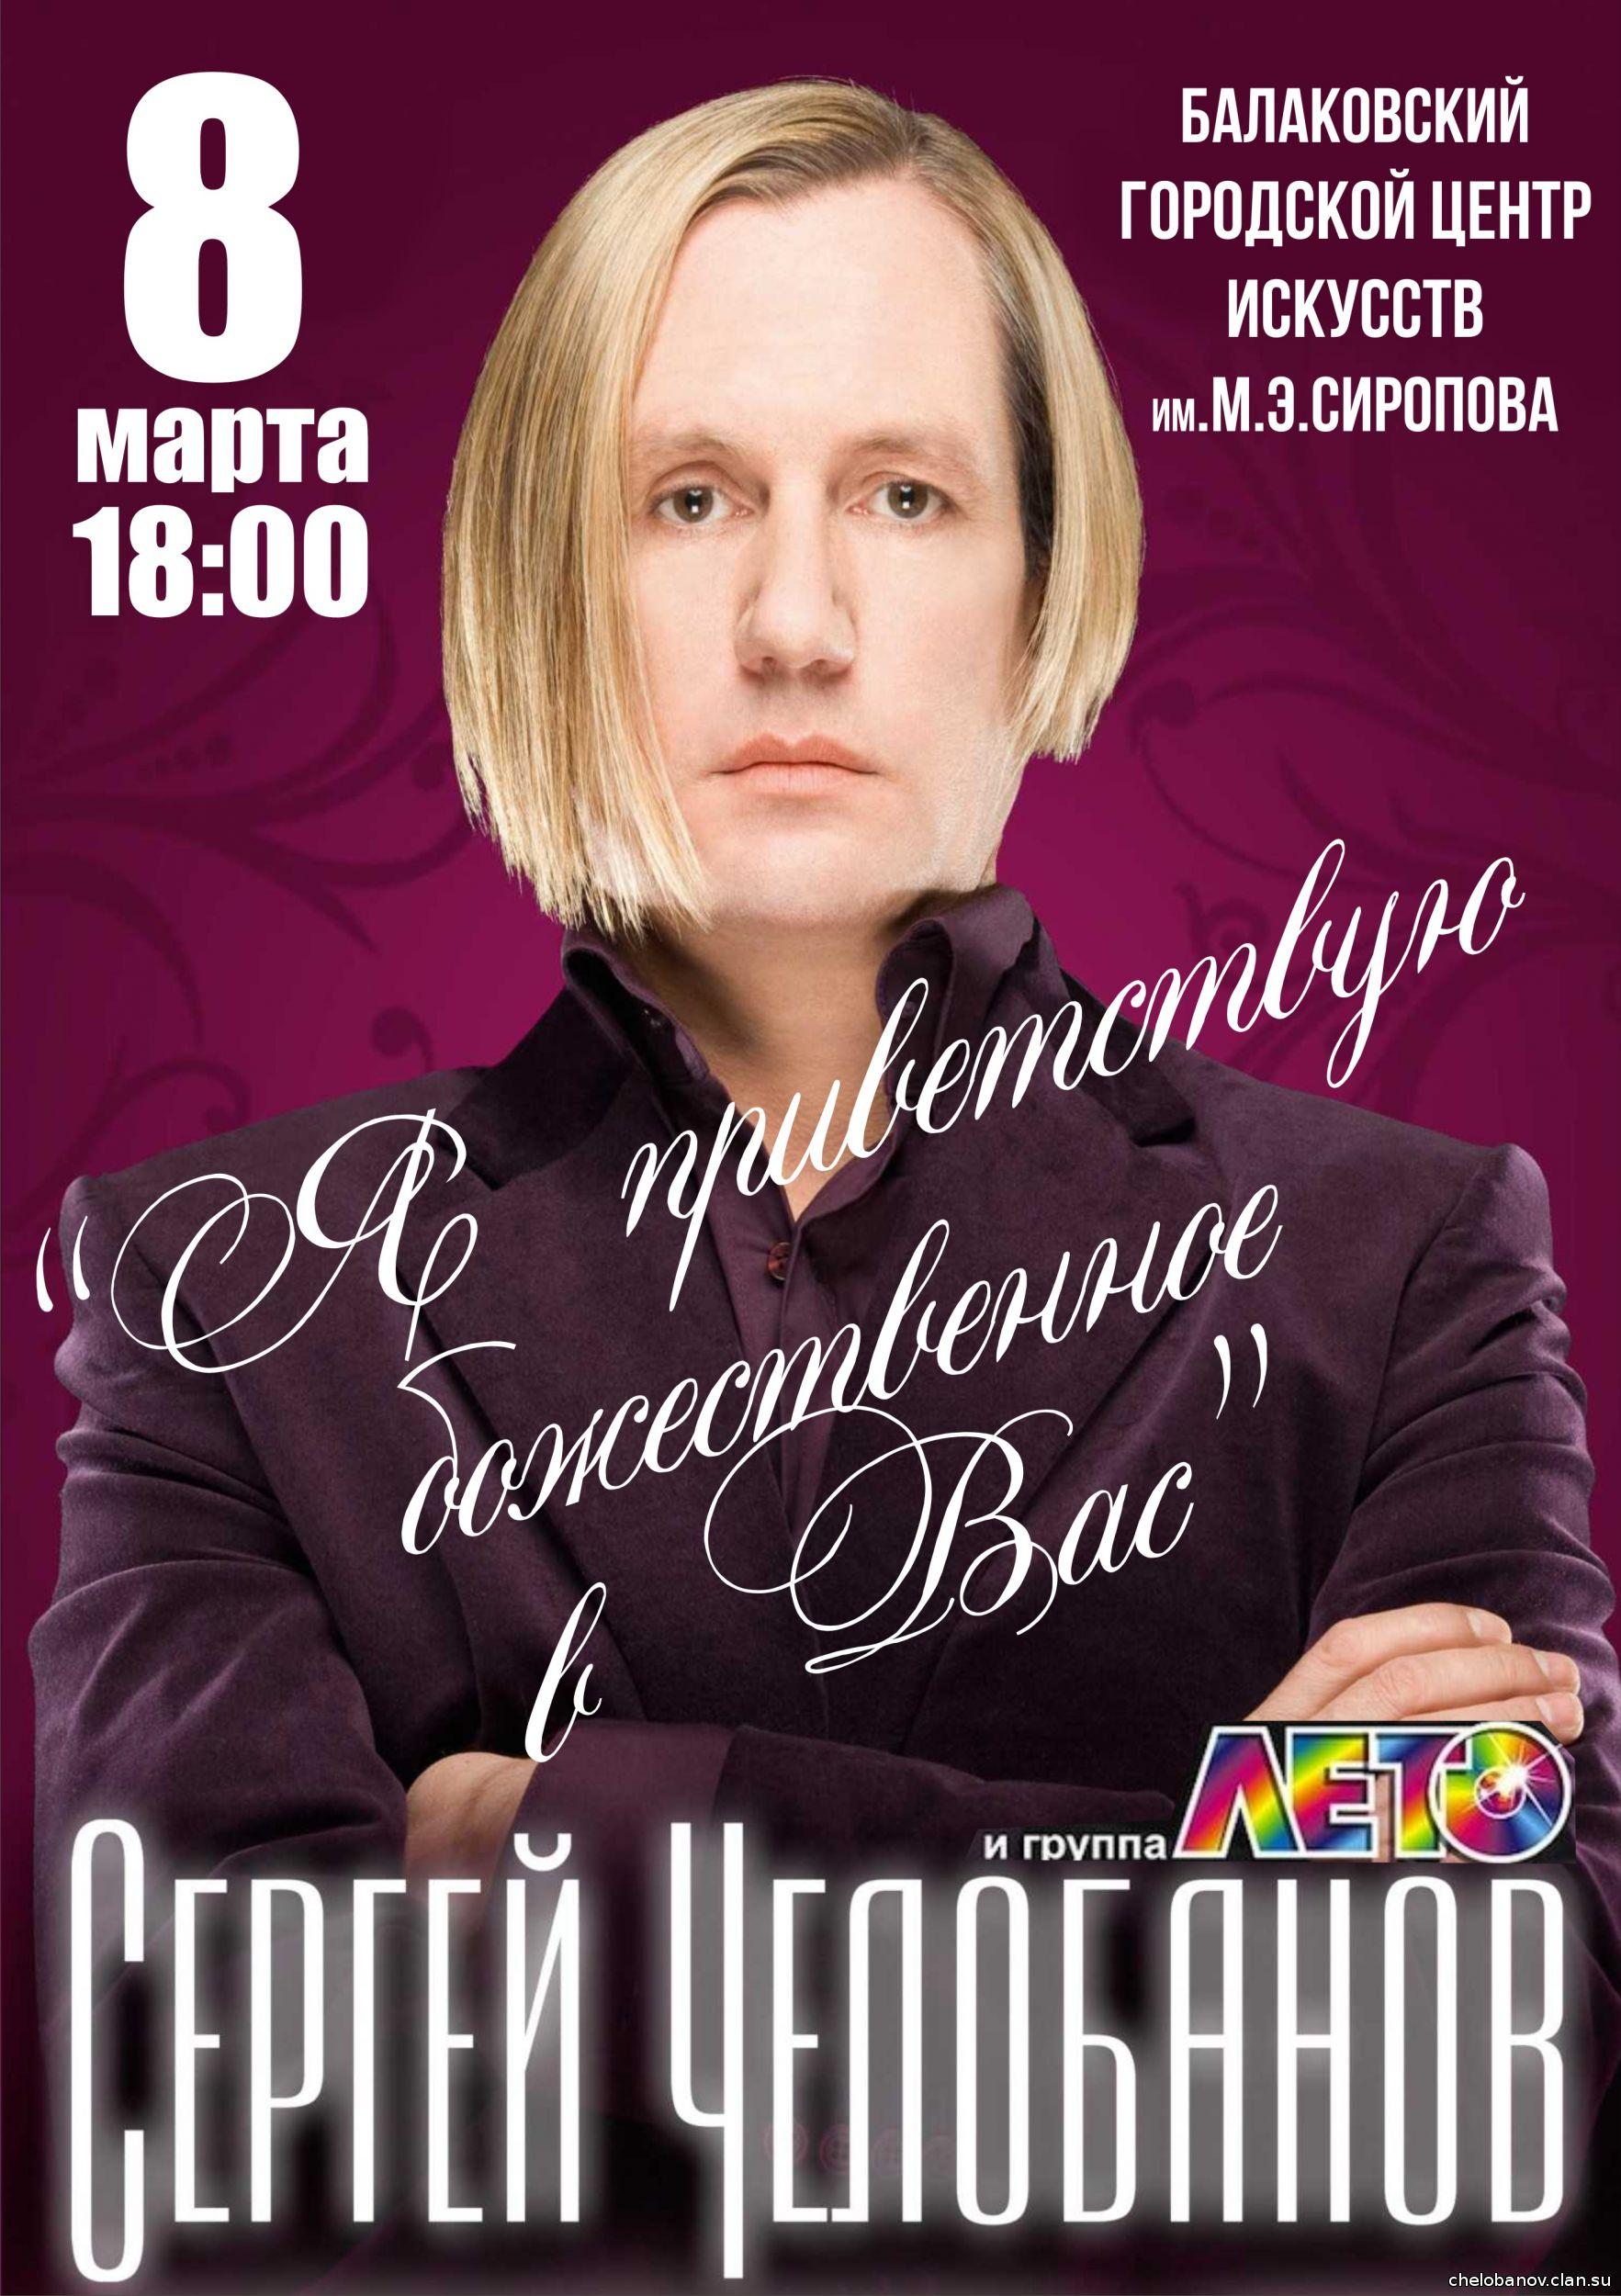 Концерт Сергея Васильевича Челобанова в городе Балаково